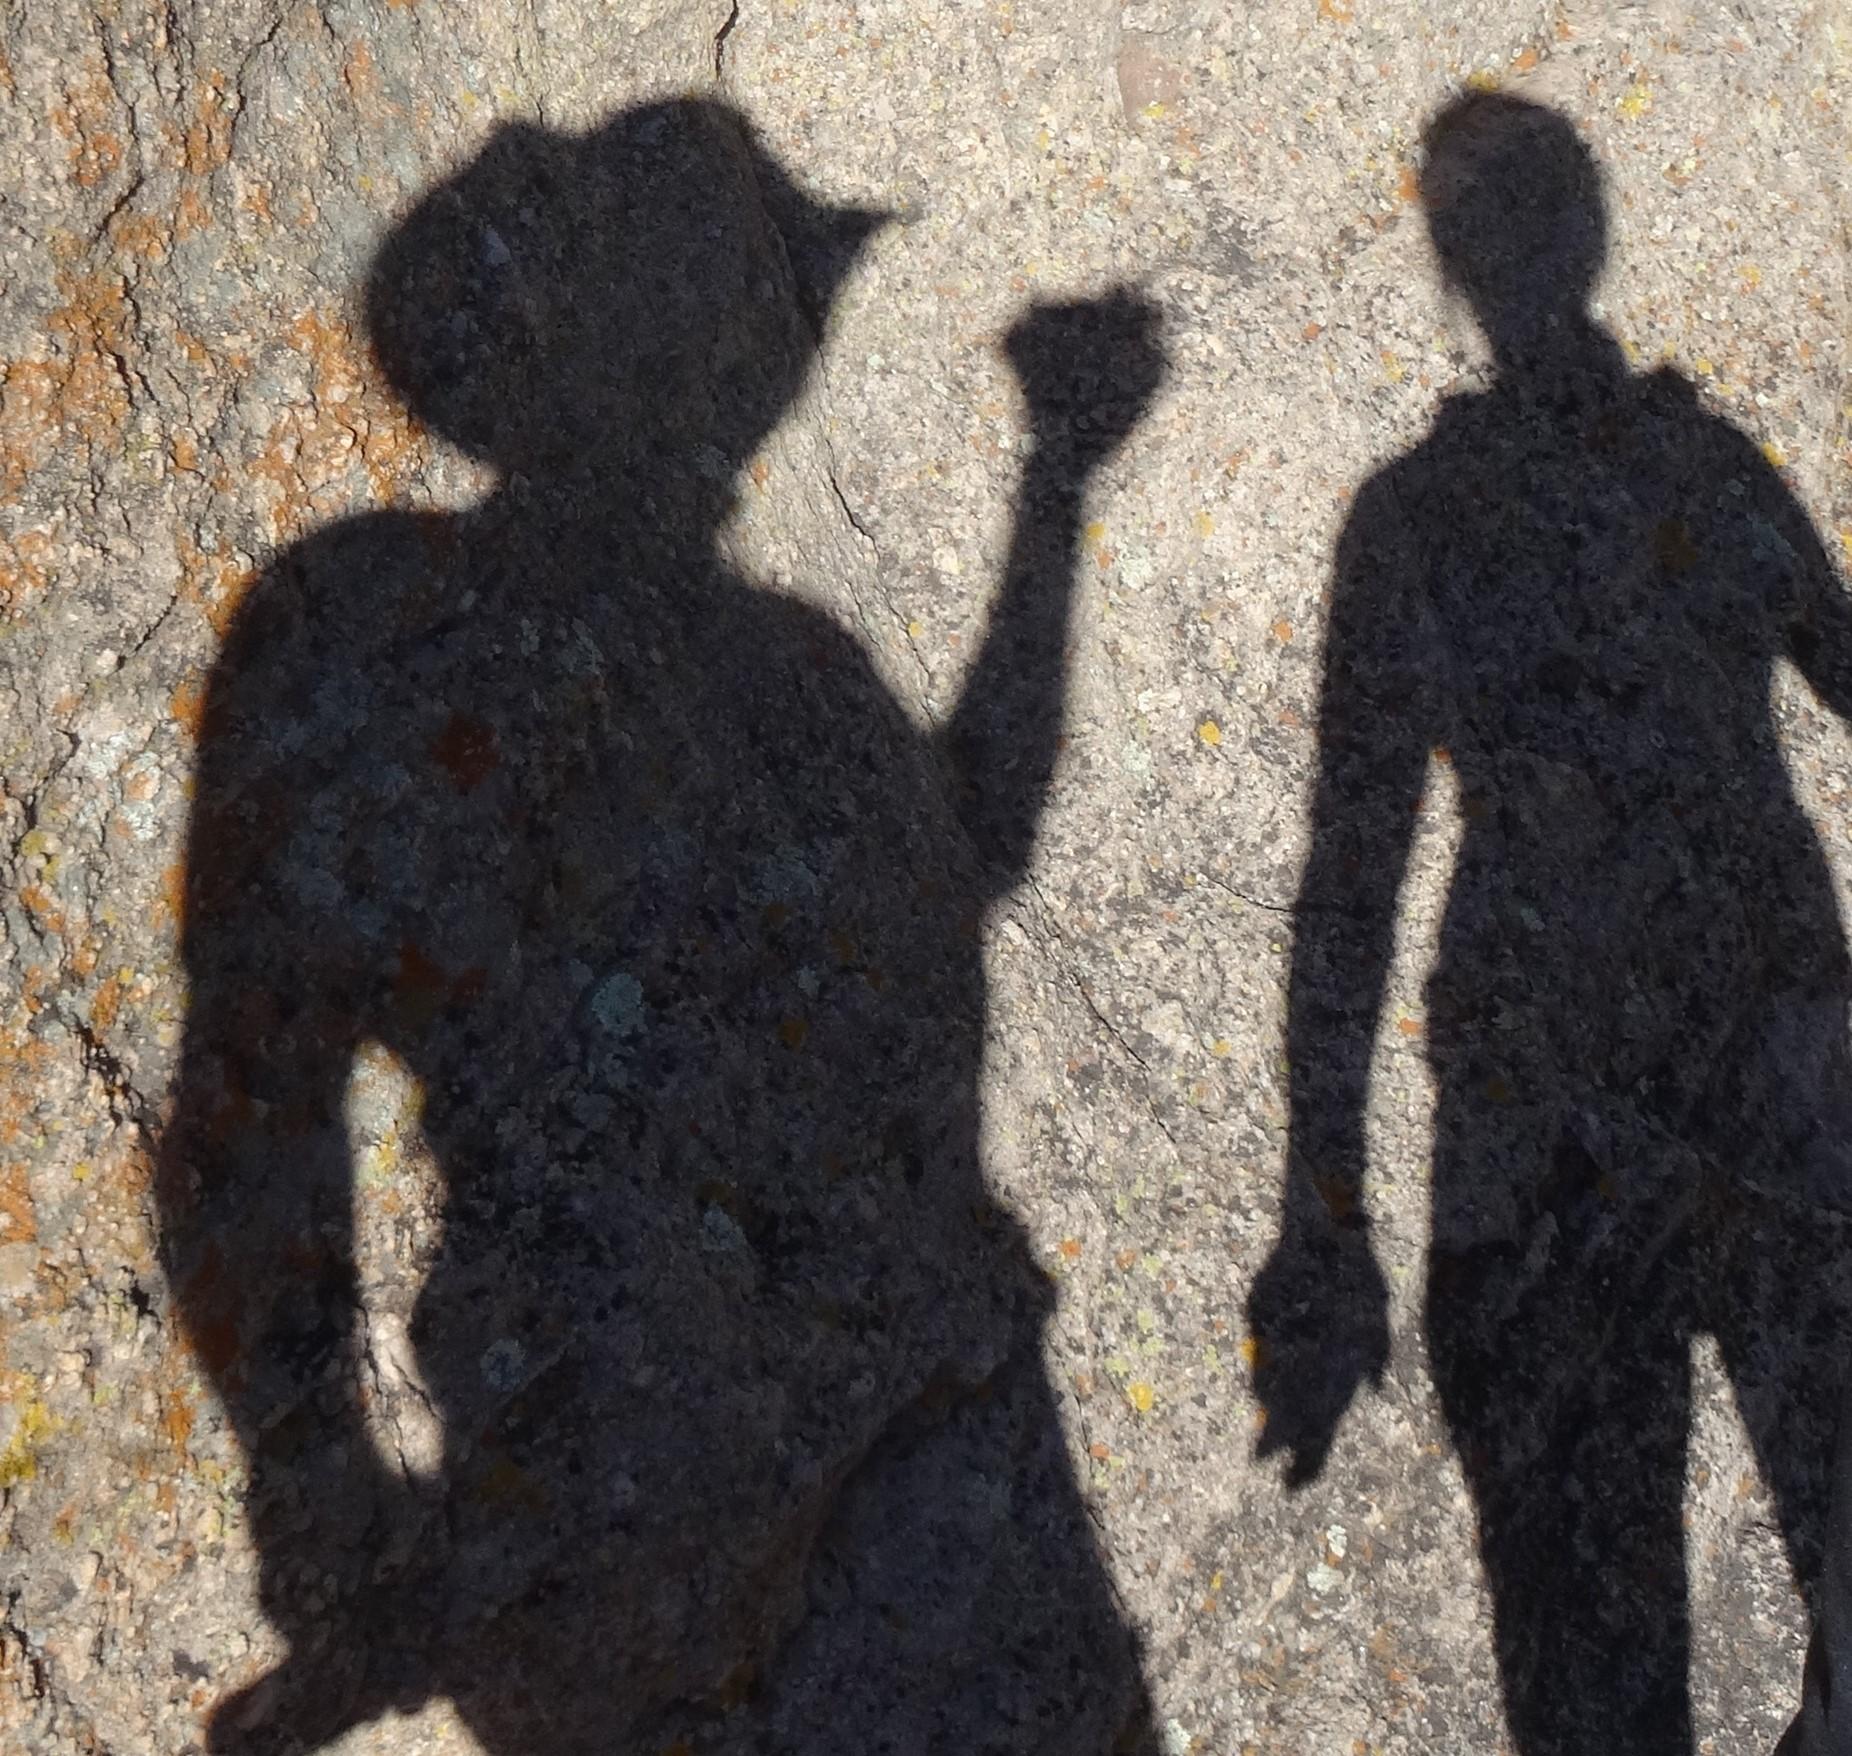 Casting Shadows, Gila Natl Monument, NM